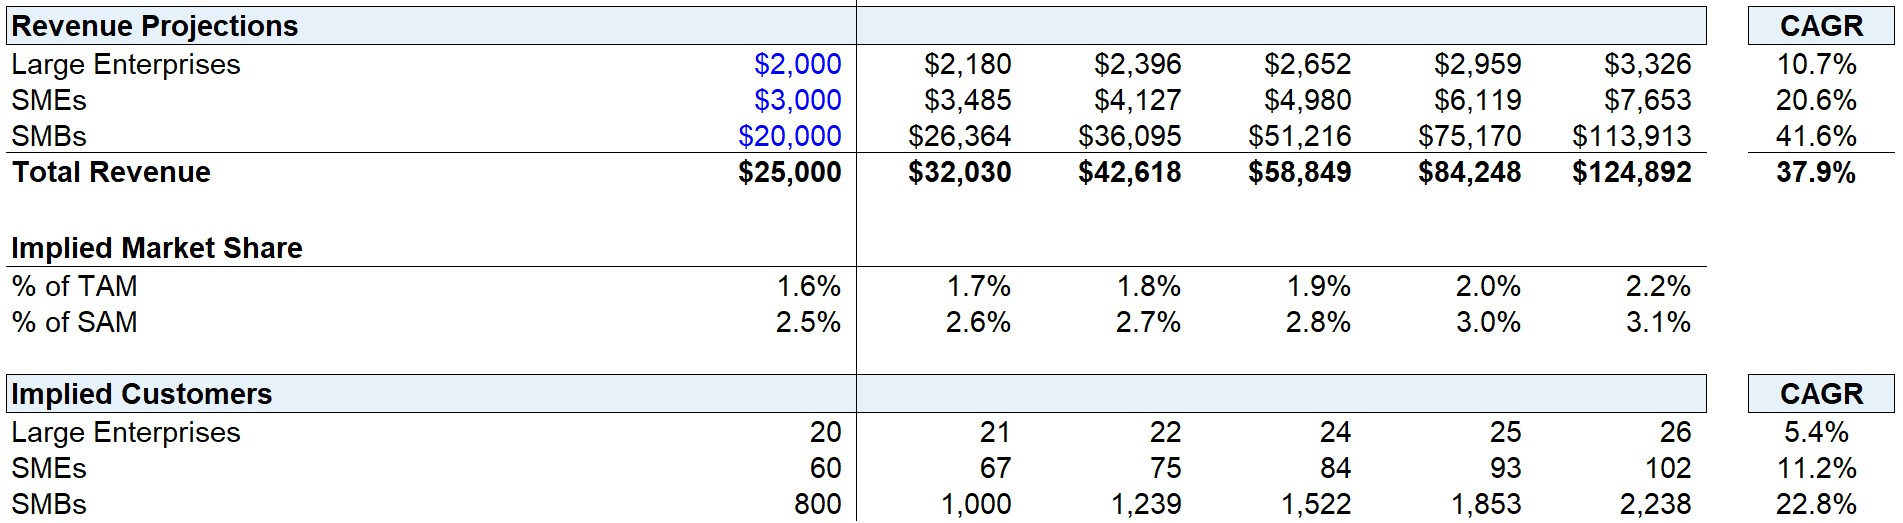 Revenue Projections Calculation